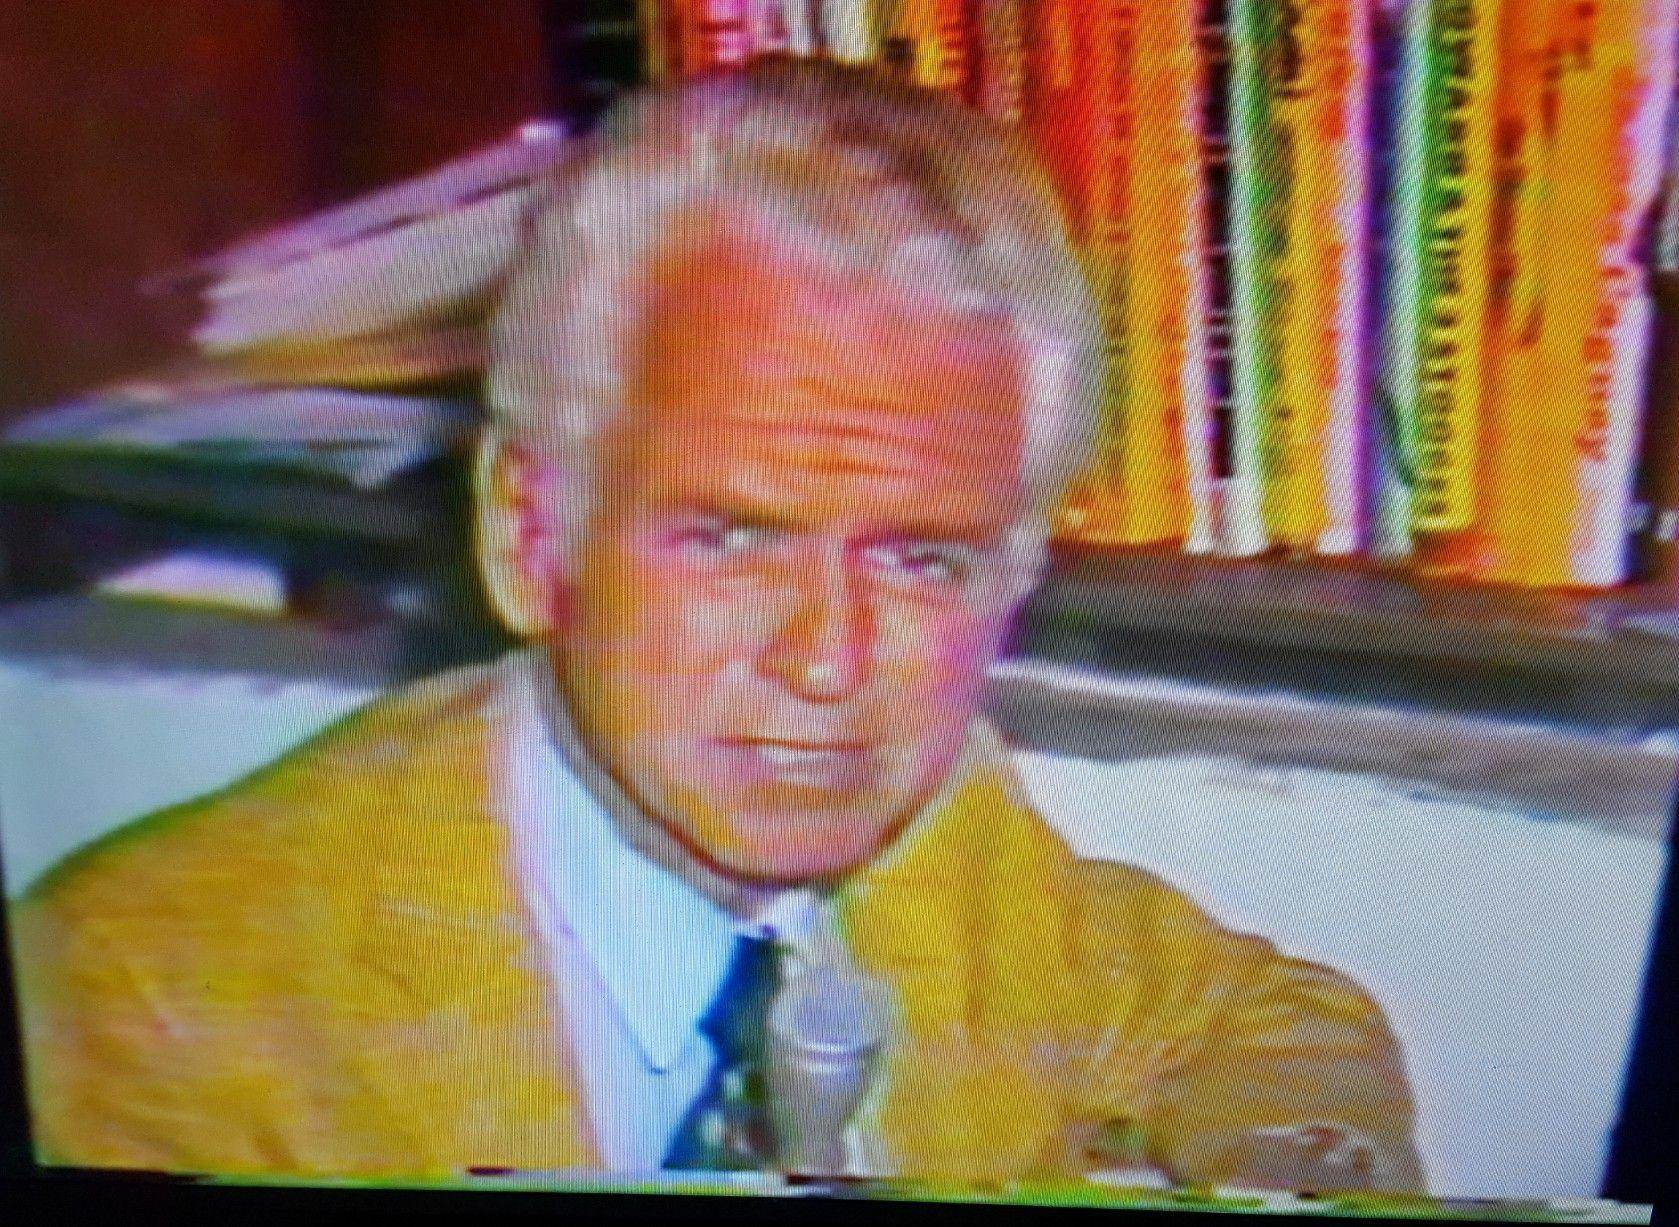 Chris Condon Ksd Tv 1977 St Louis Missouri St Louis Mo Memories